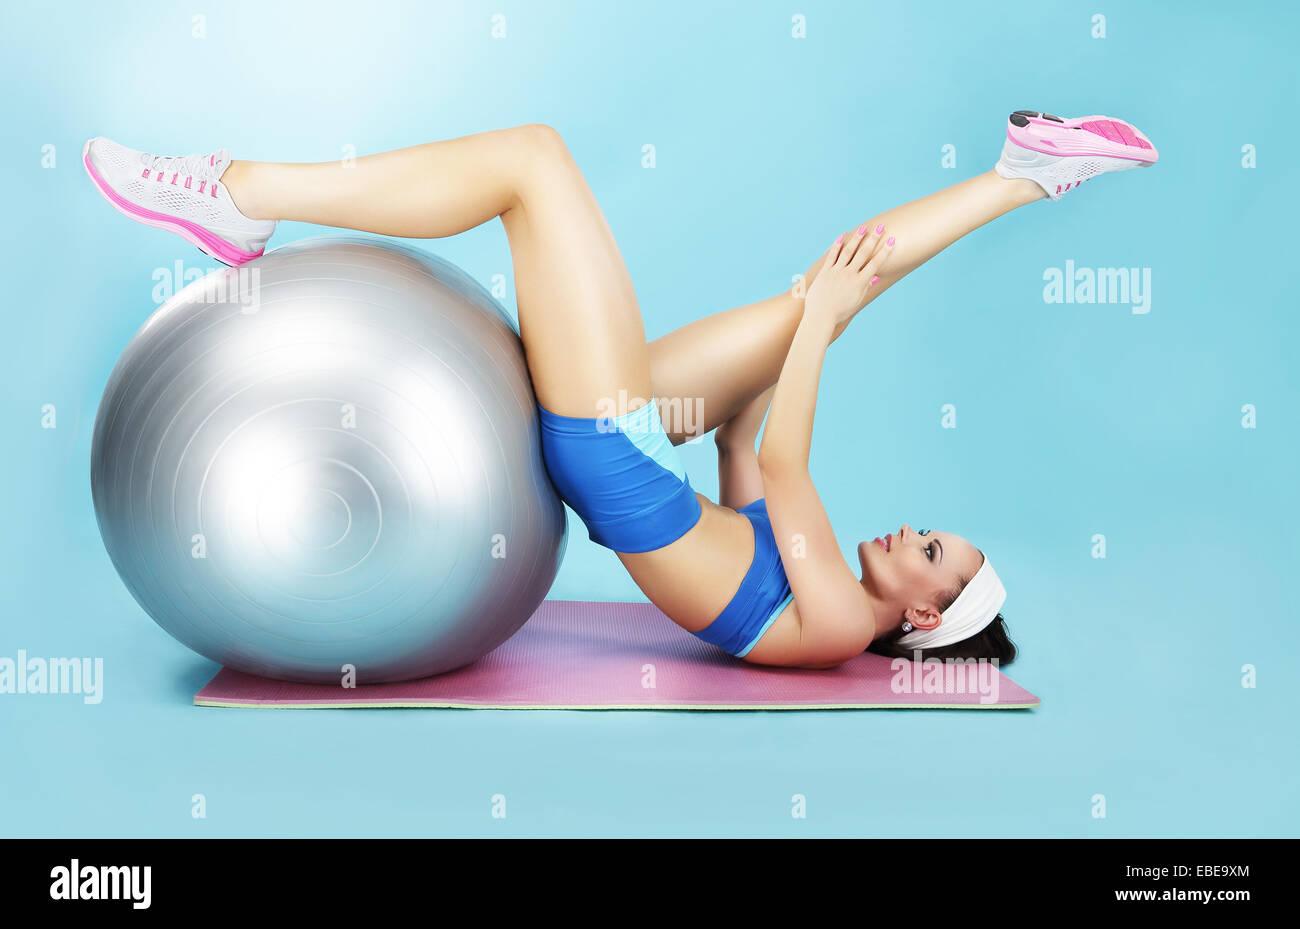 Wellness-Konzept. Frau in Sportkleidung mit Sportgeräten Stockbild